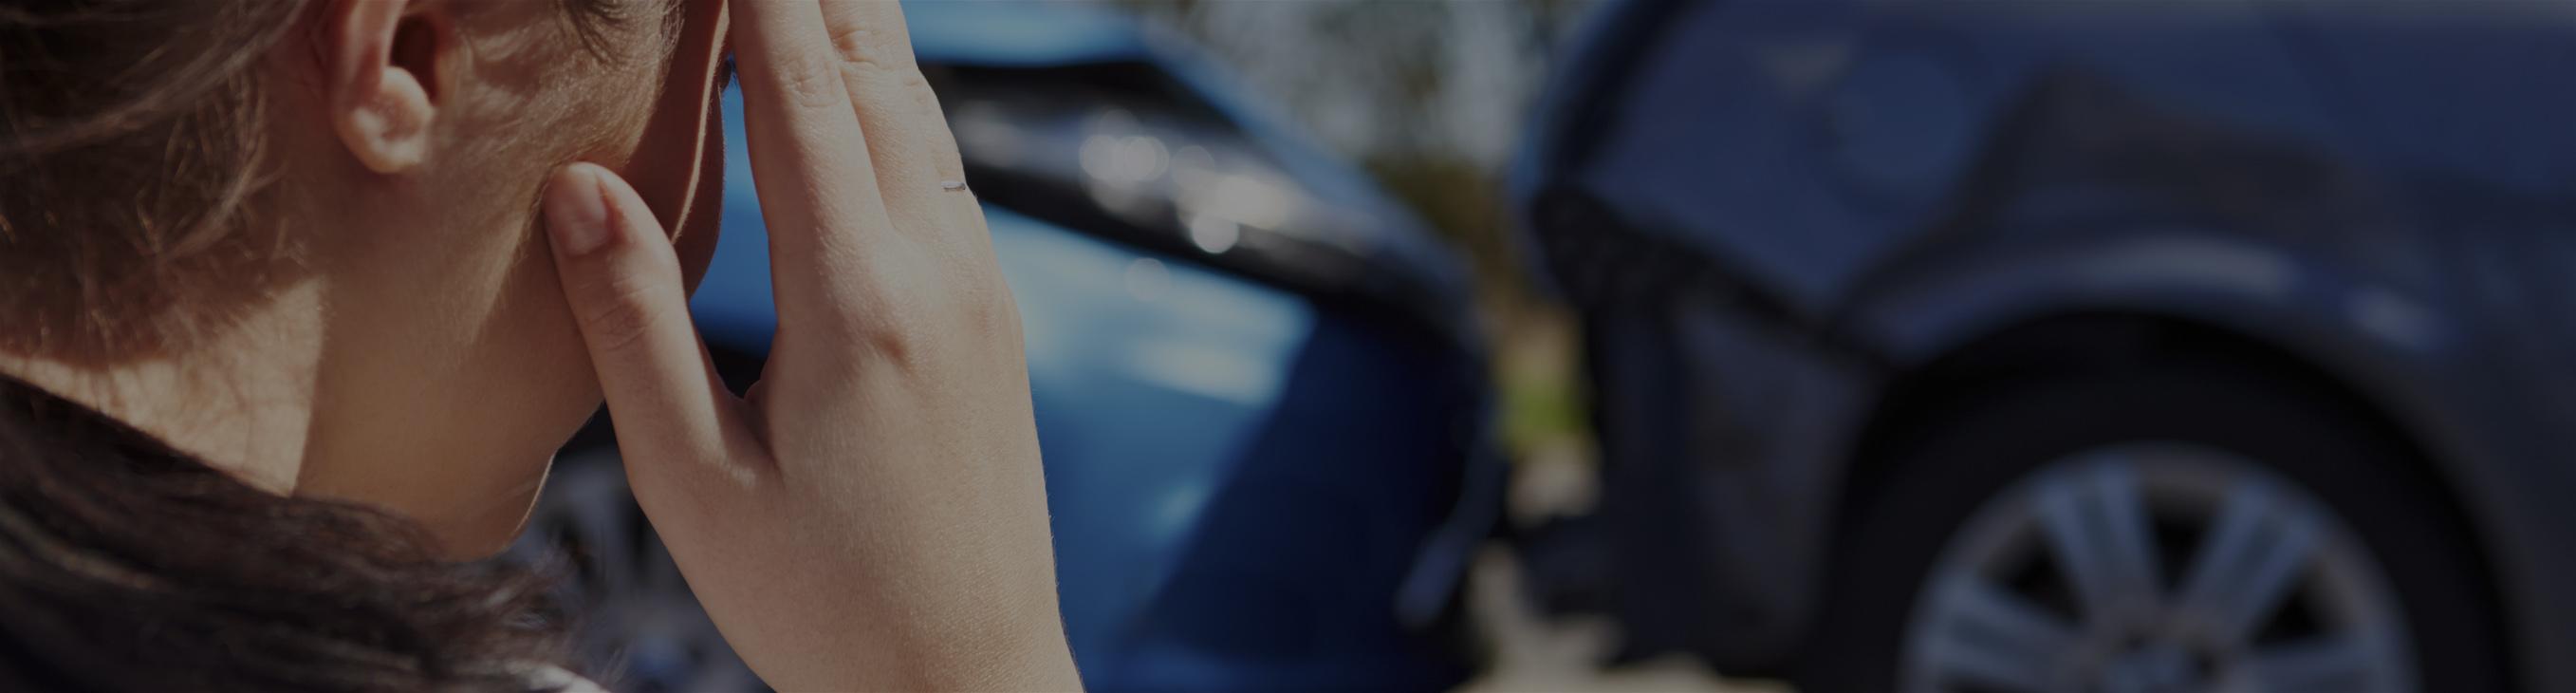 Boca Raton Passenger Injuries Lawyers